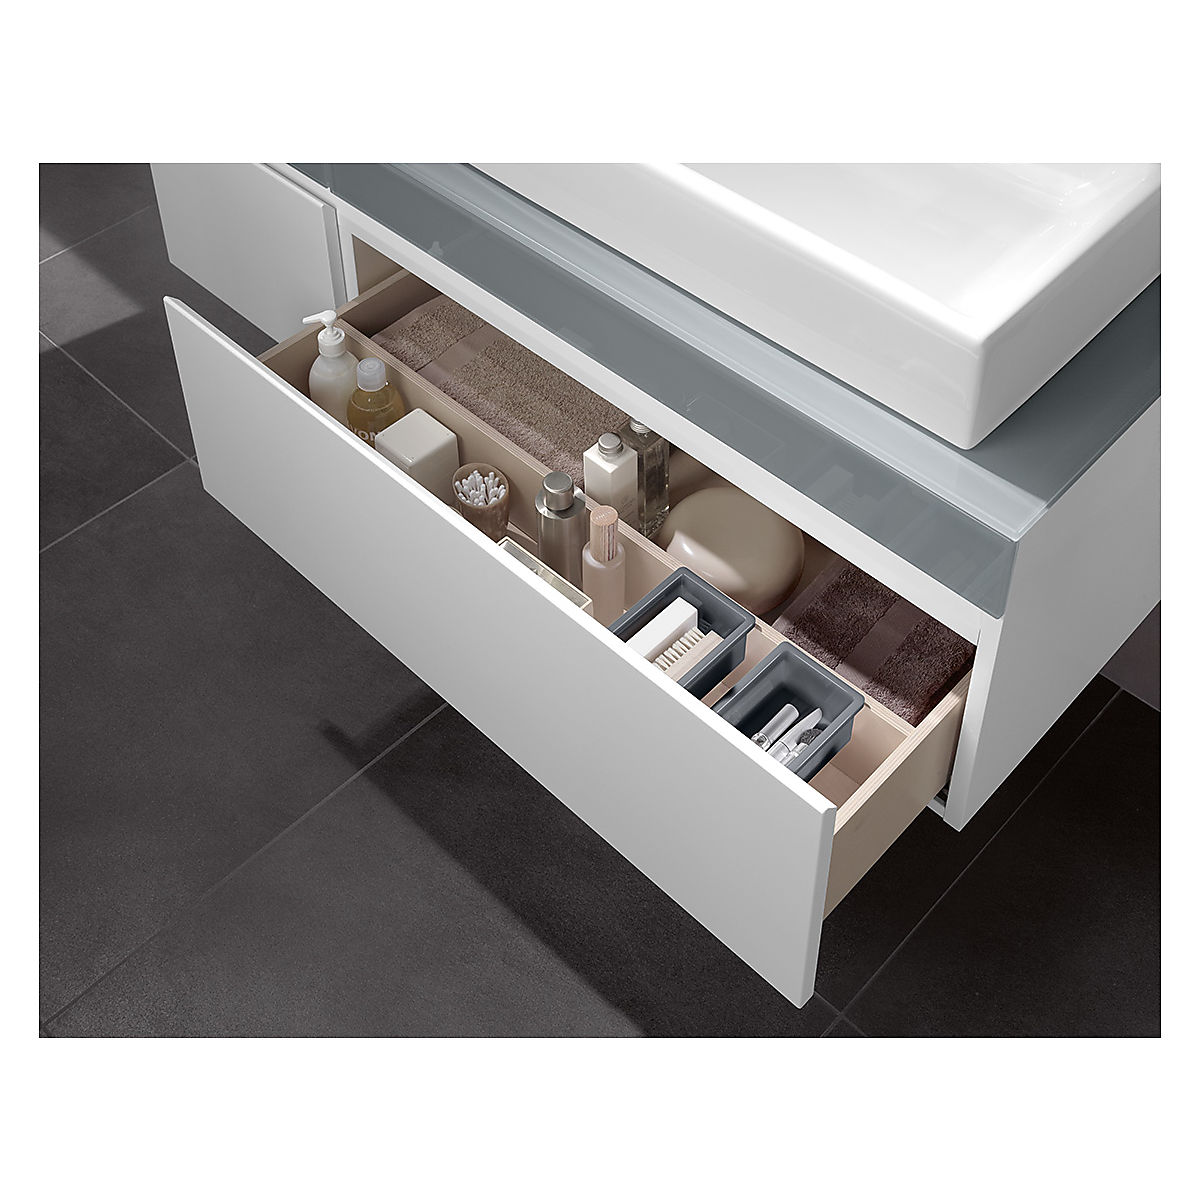 v b memento servantskap m 2 skuffer 1306x425 mm h yre bright oak. Black Bedroom Furniture Sets. Home Design Ideas